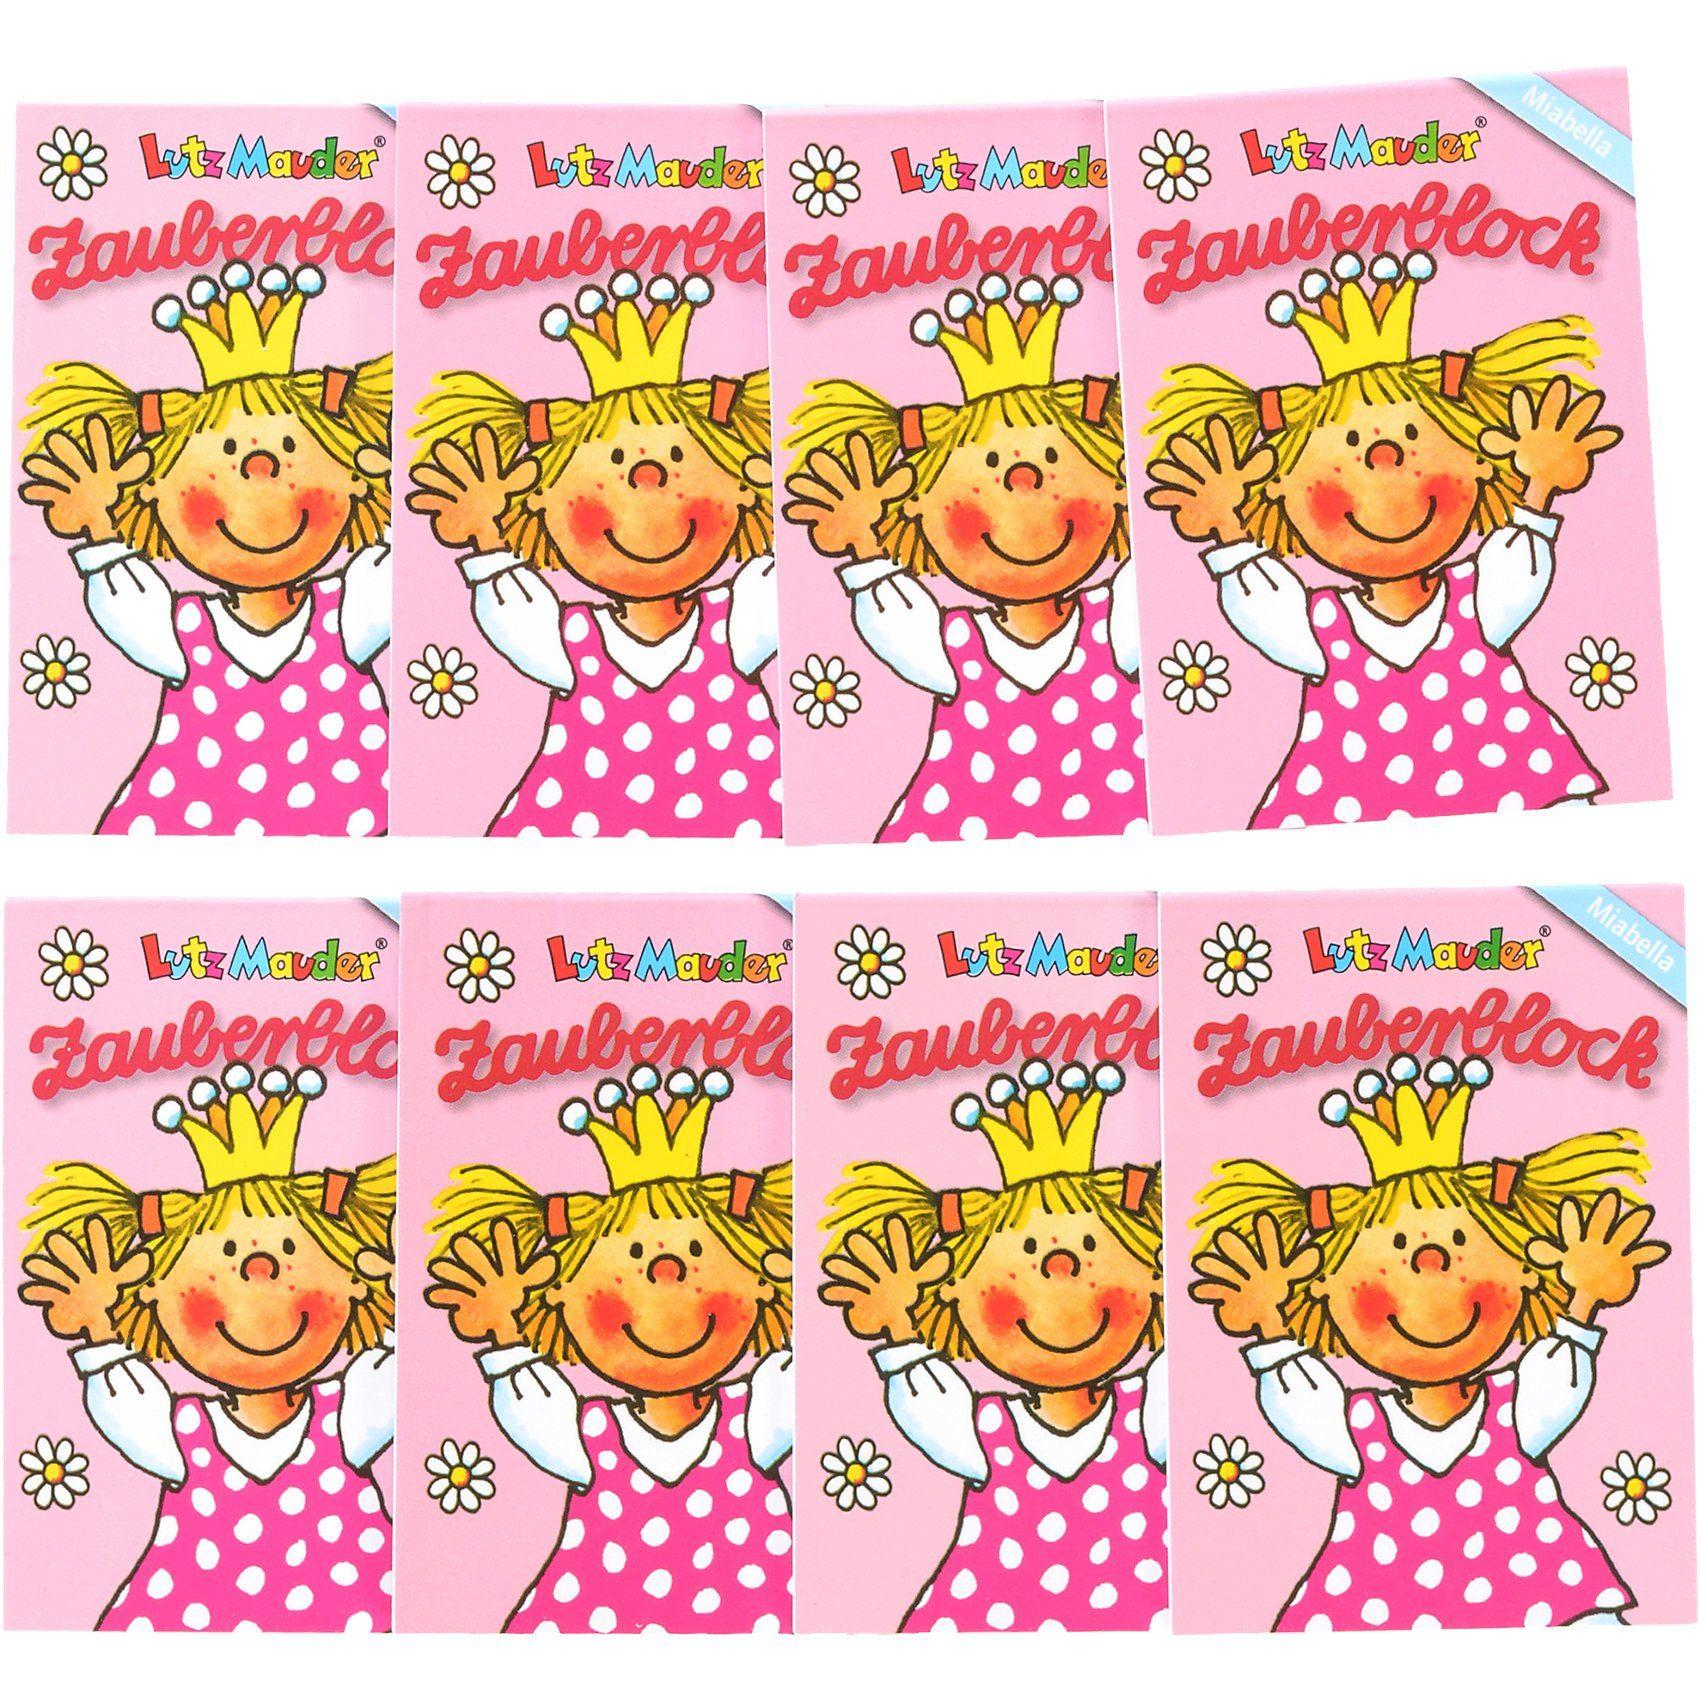 Lutz Mauder Verlag Zauberblock Prinzessin Miabella A8, 8-tlg.